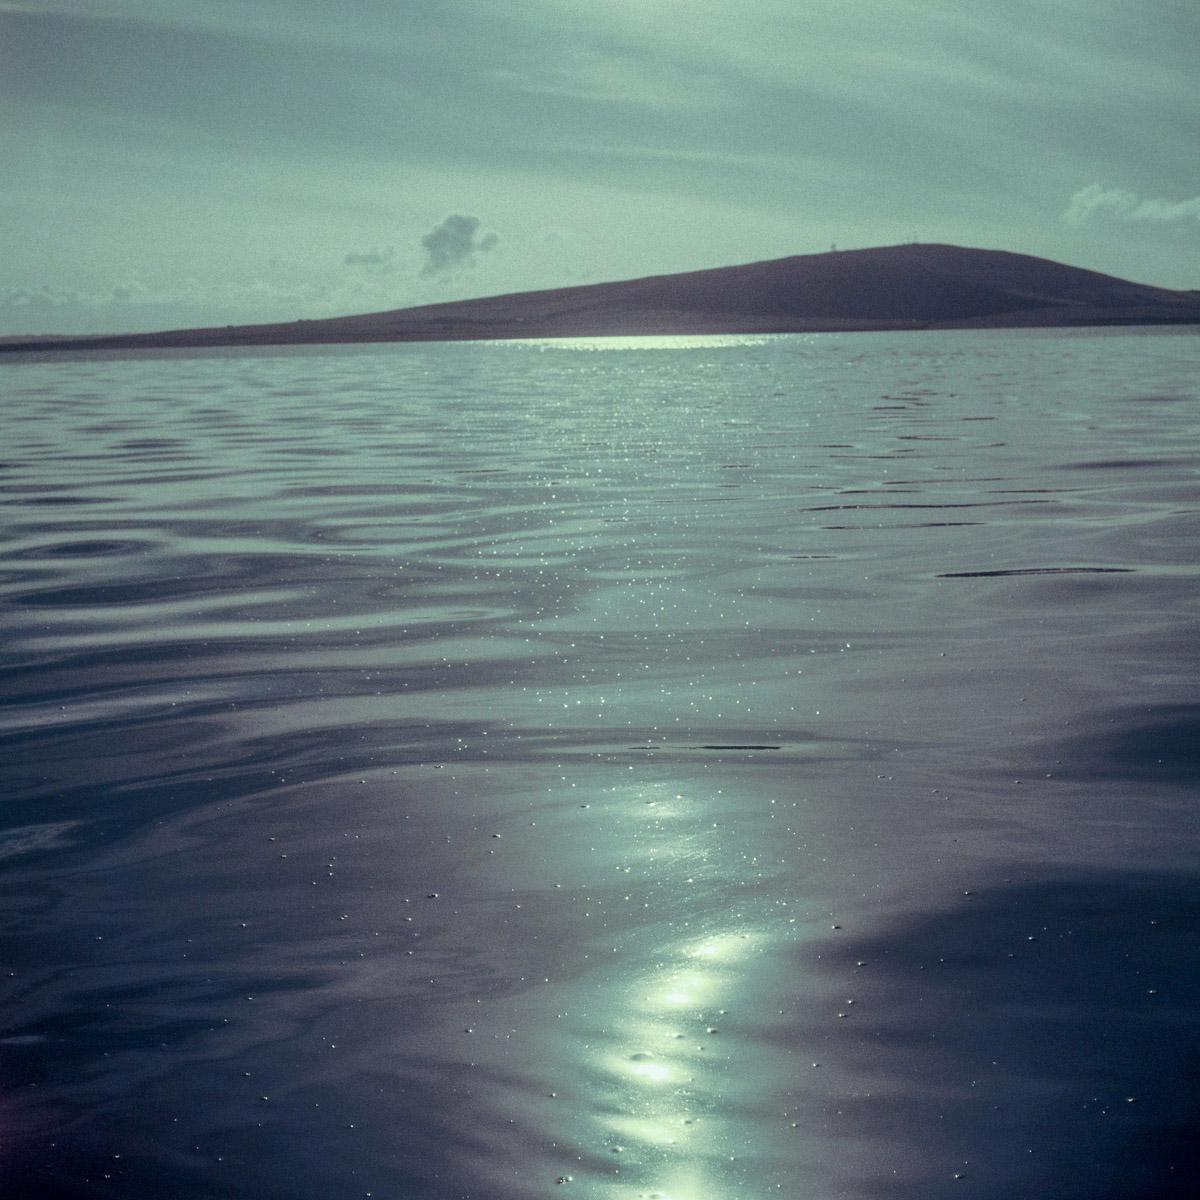 orkney-joanne-coates-island-review